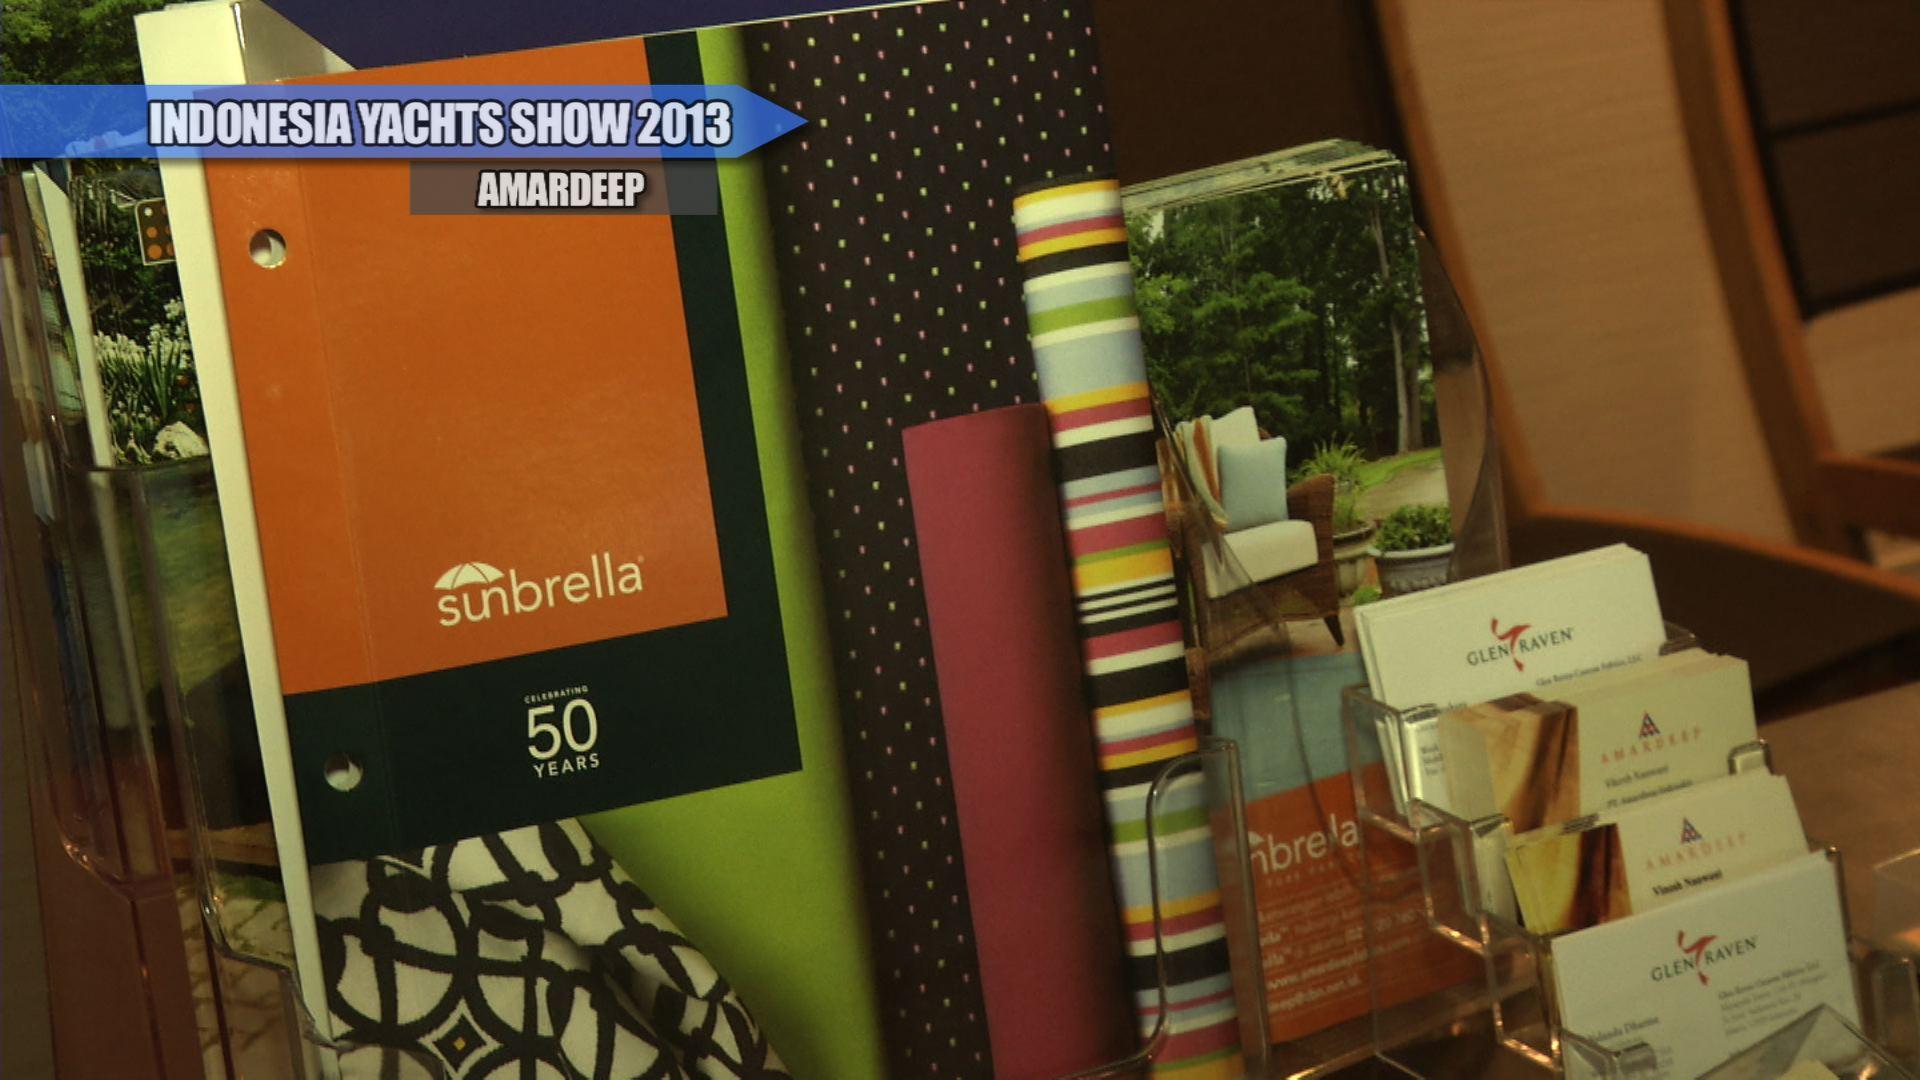 Amardeep / Sunbrella (Indonesia Yachts Show 2013)